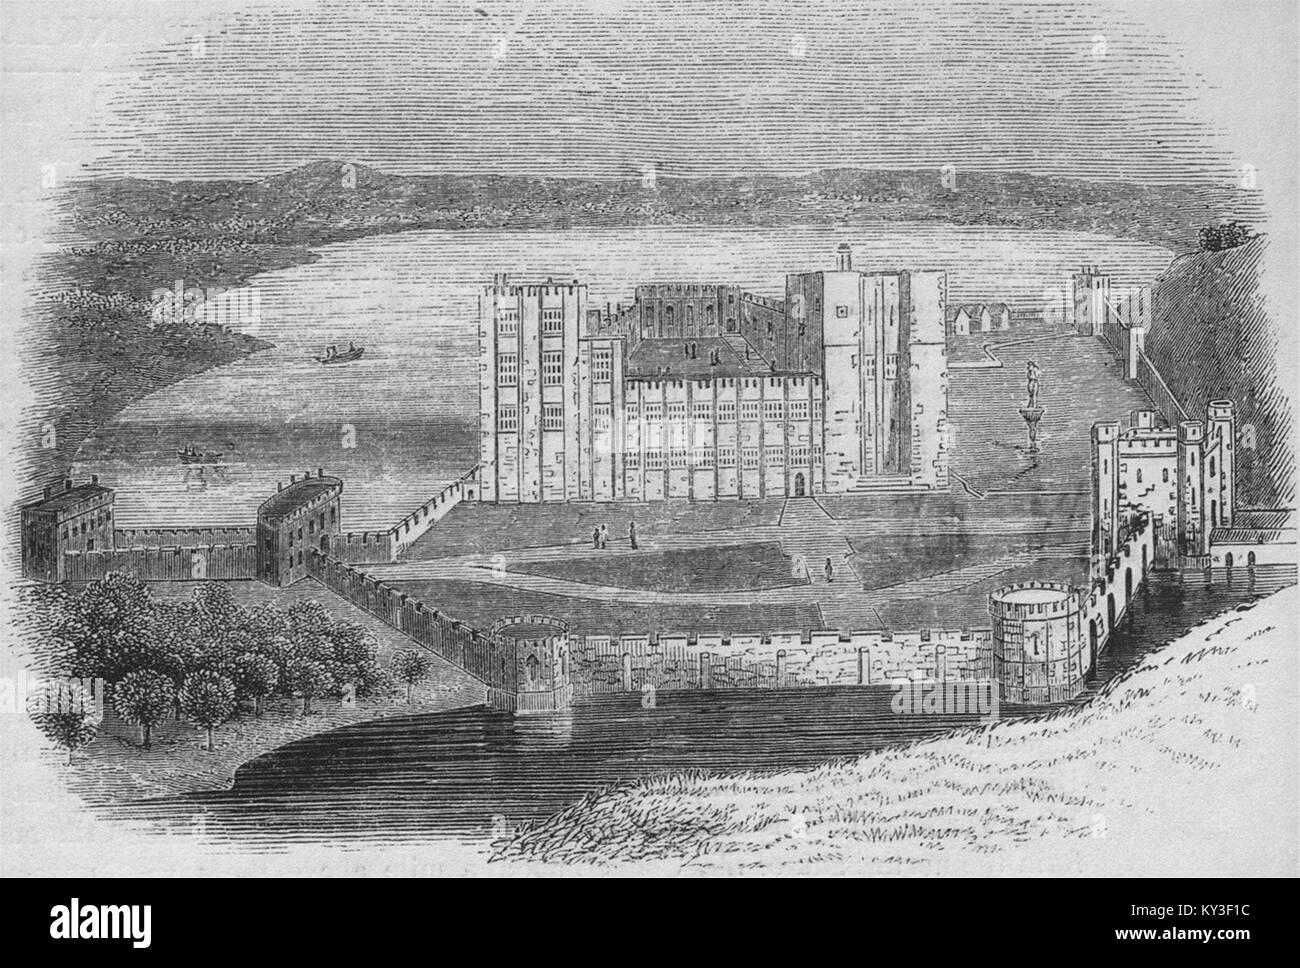 430 - Kenilworth Castle im Jahre 1620. Warwickshire 1845. Old England Stockbild